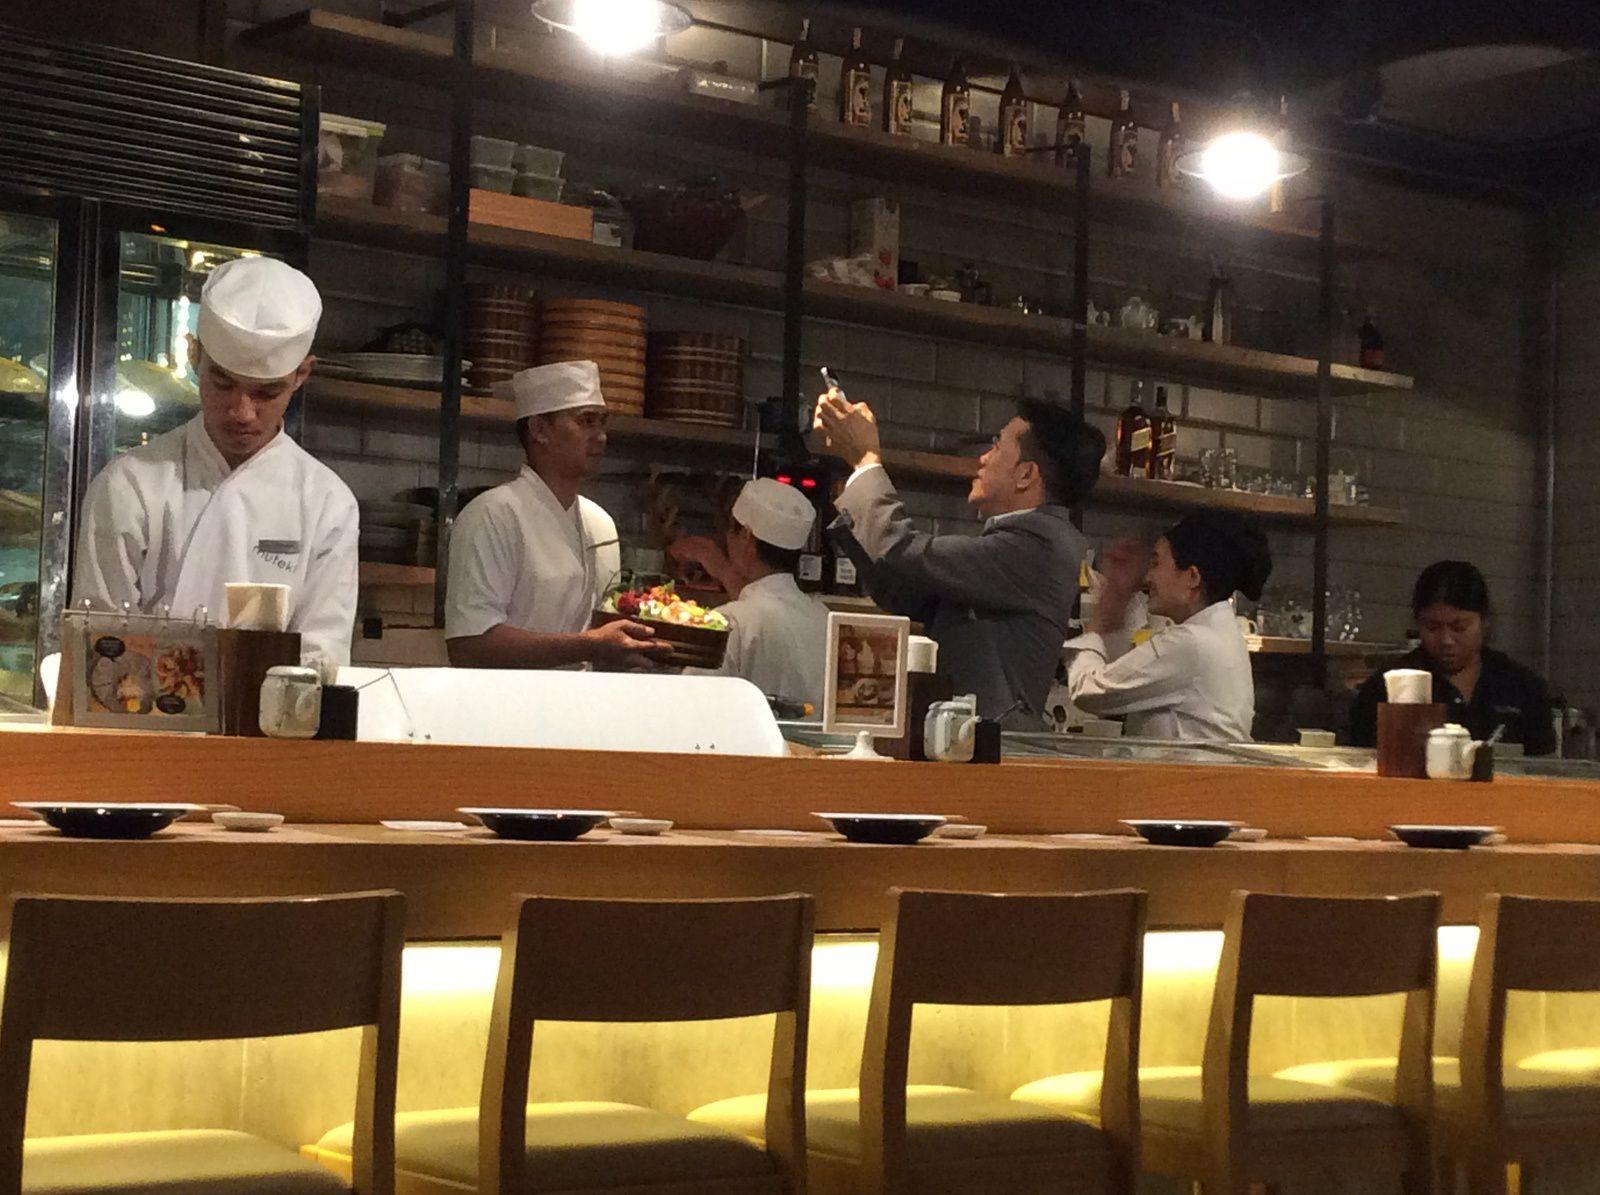 Repas chic? Mutekibkk.... 100% japonais